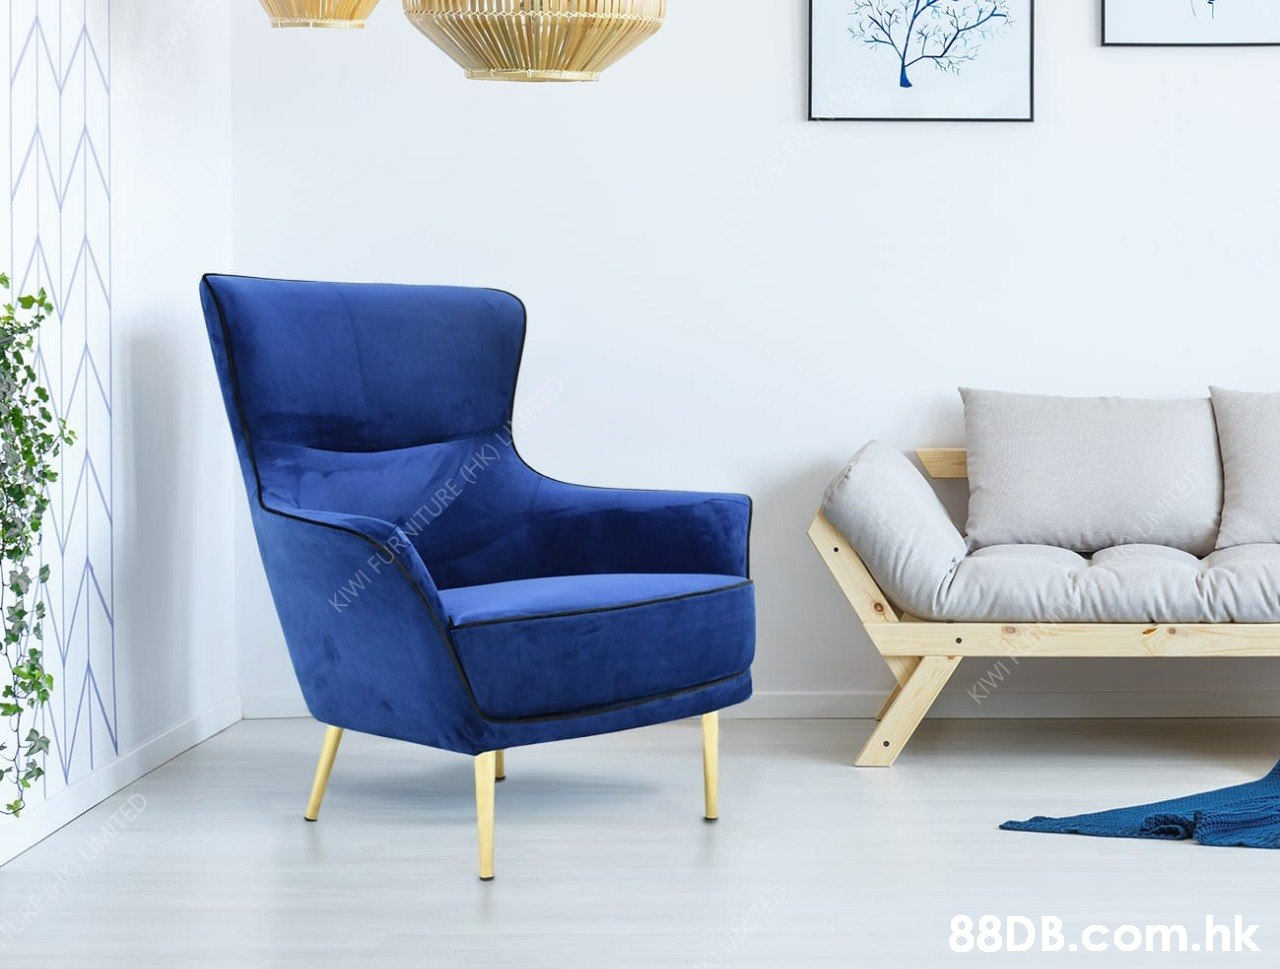 KIWI FURNITURE (HK) UTEE DRE CKO LIMITED TED KIW MTED .hk  Furniture,Blue,Chair,Living room,Room